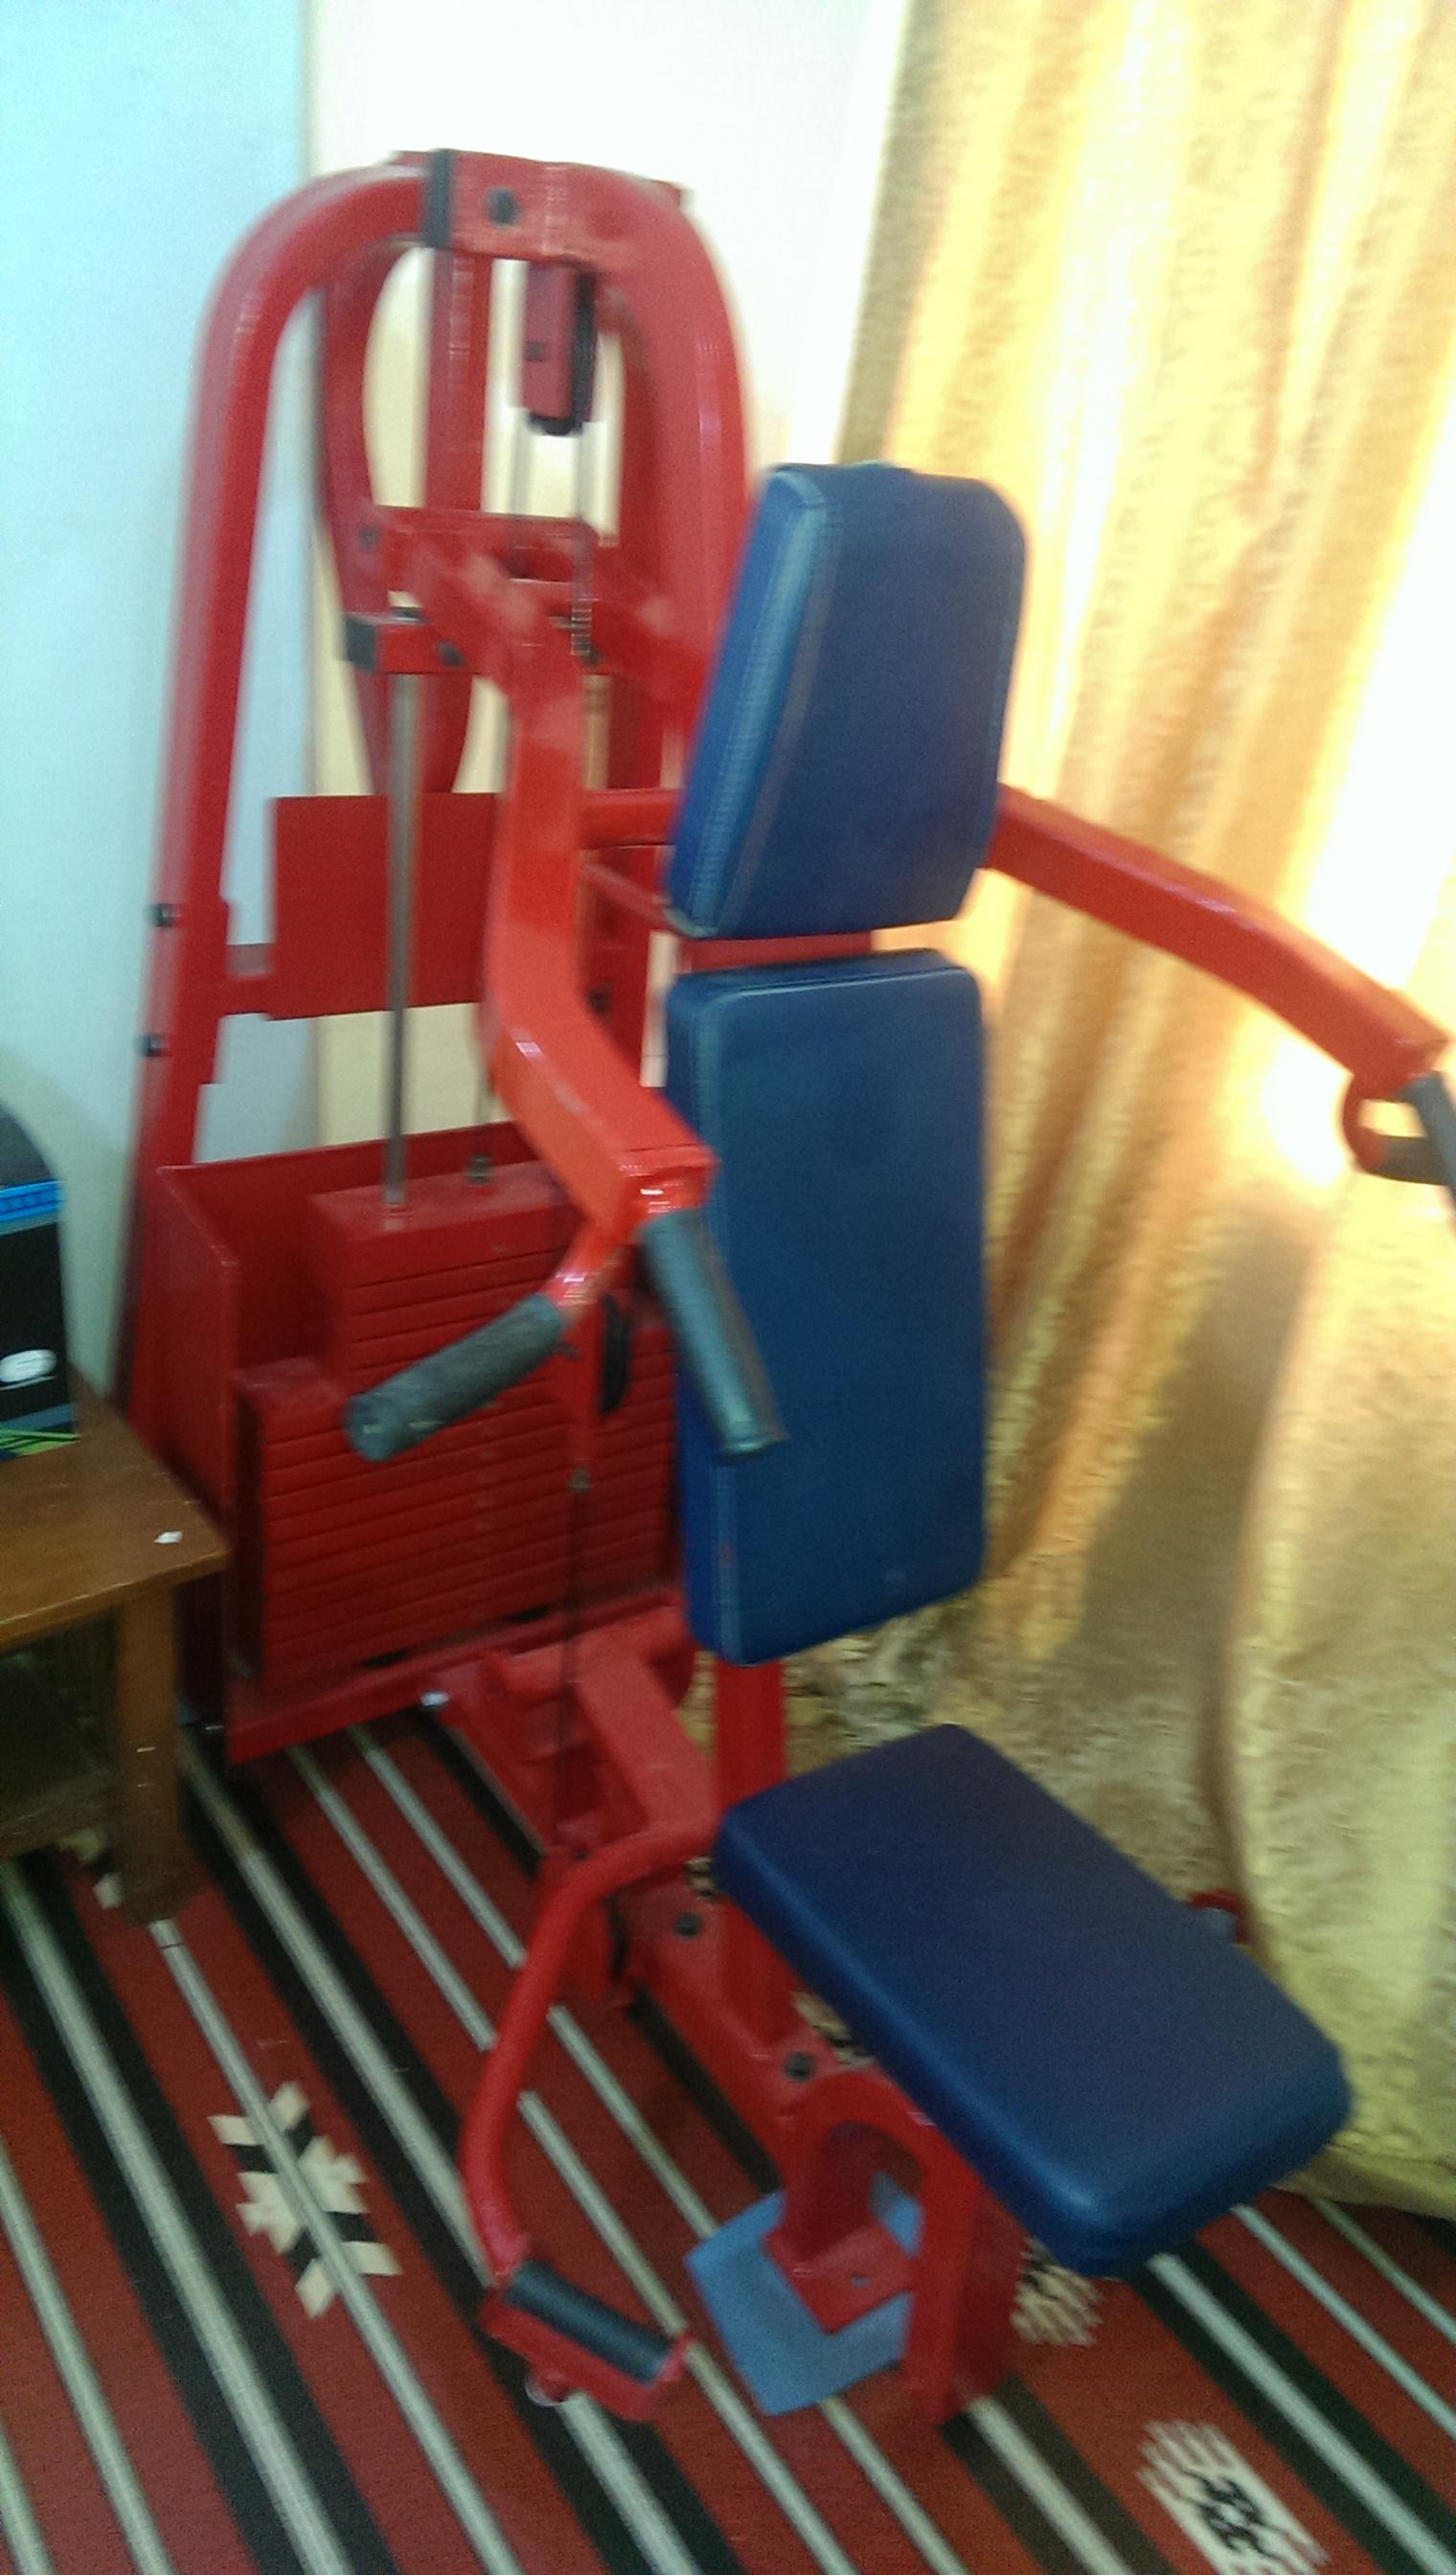 Shoulder press exercise machine